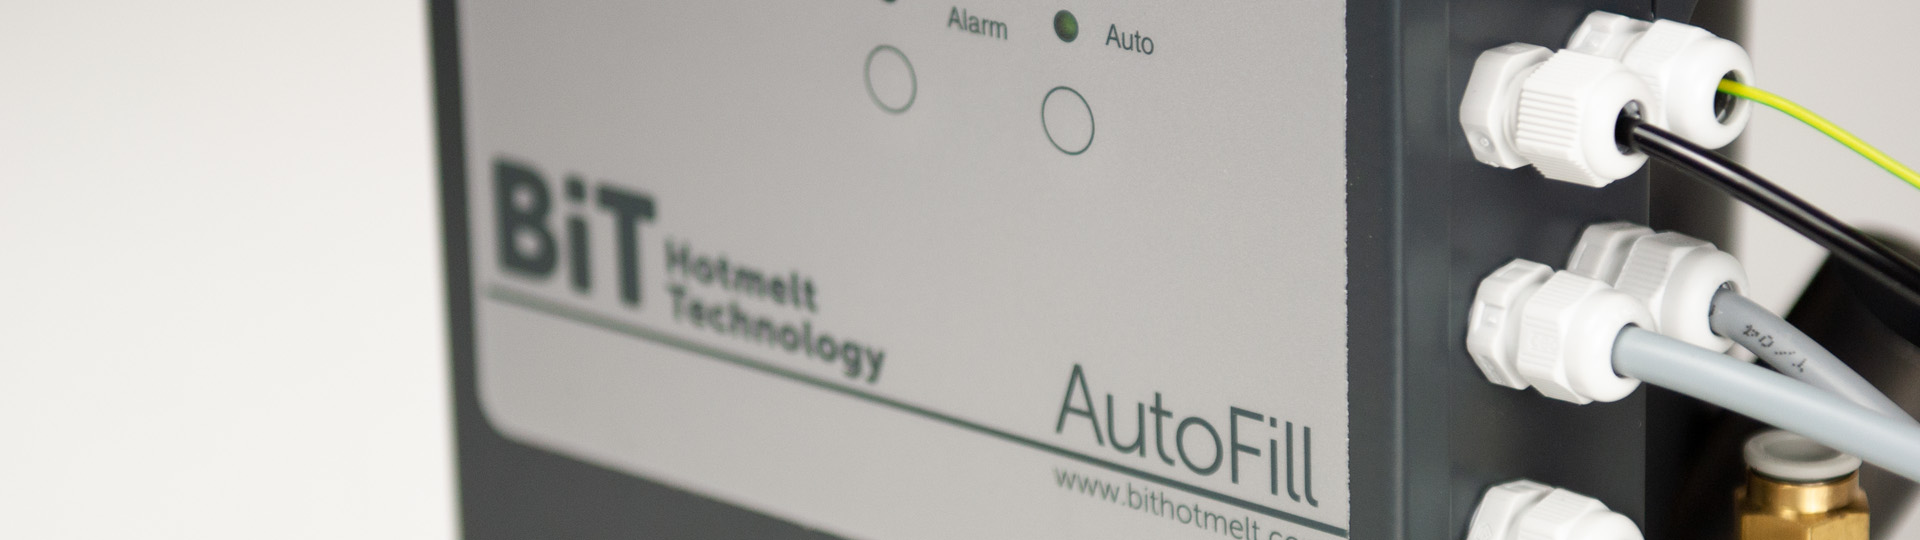 Autofill BIT Hotmelt